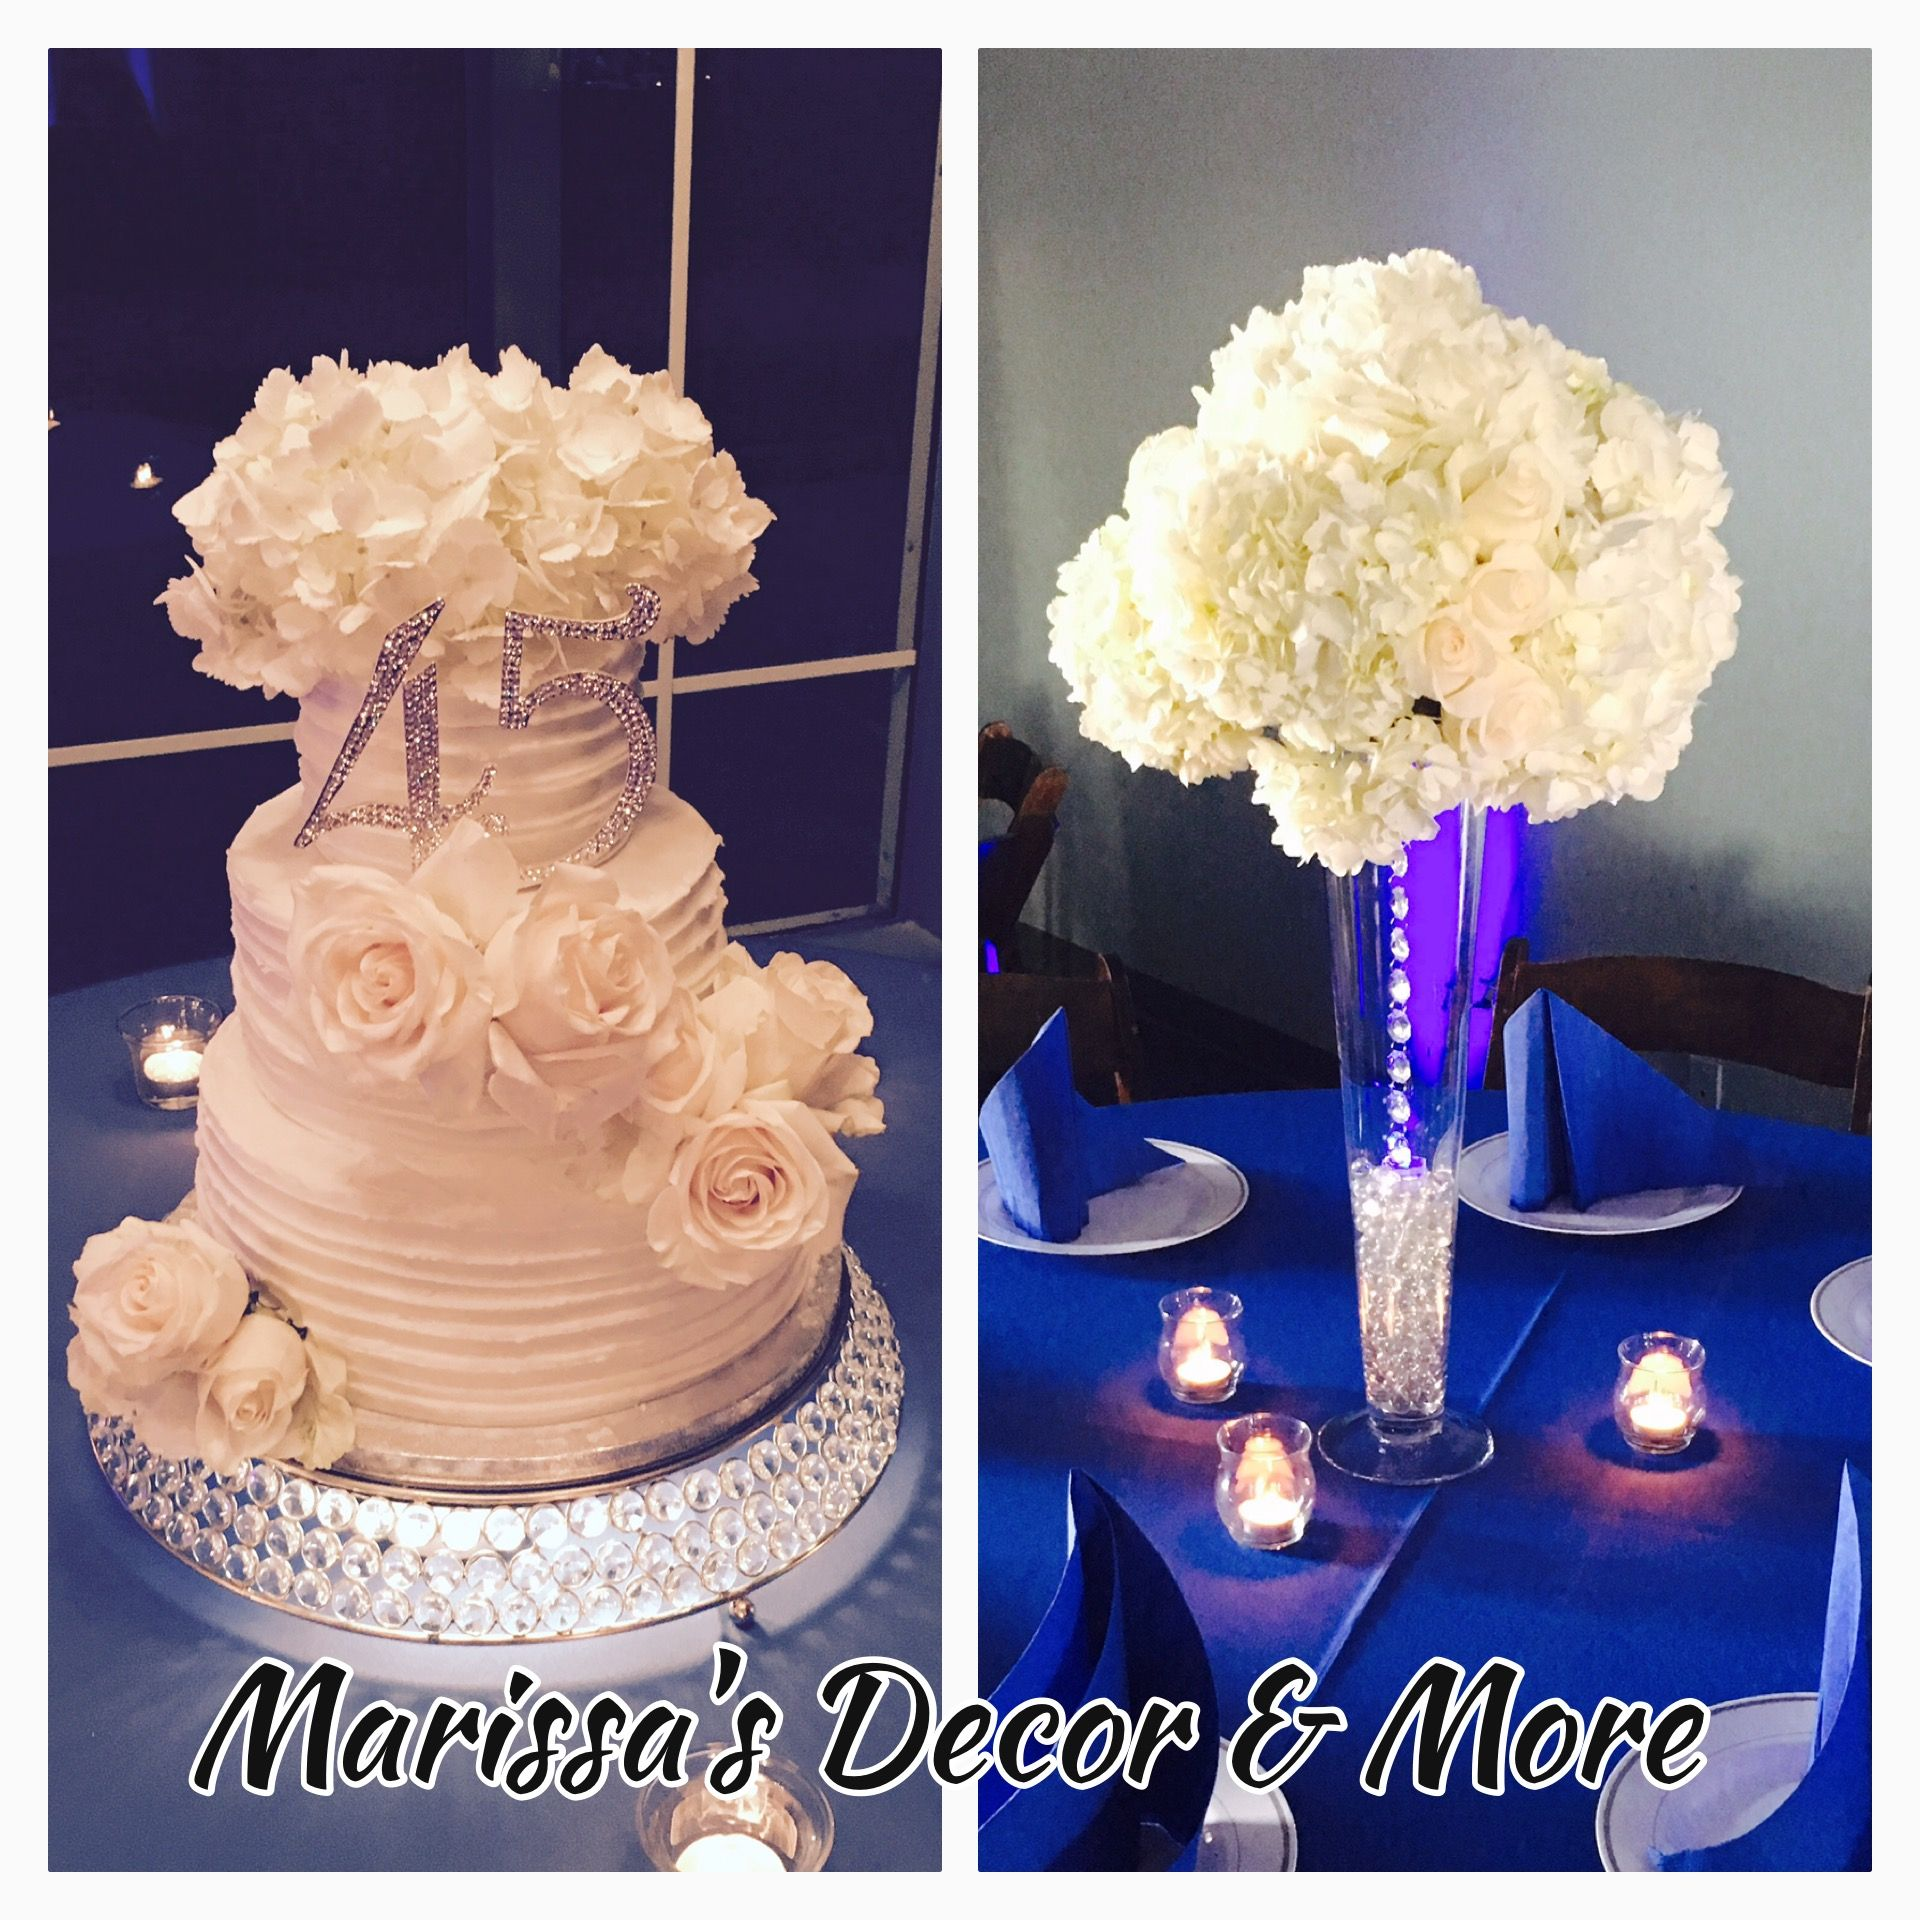 Sam S Club 3 Tier Wedding Cake Ordered With No Decor And No Border